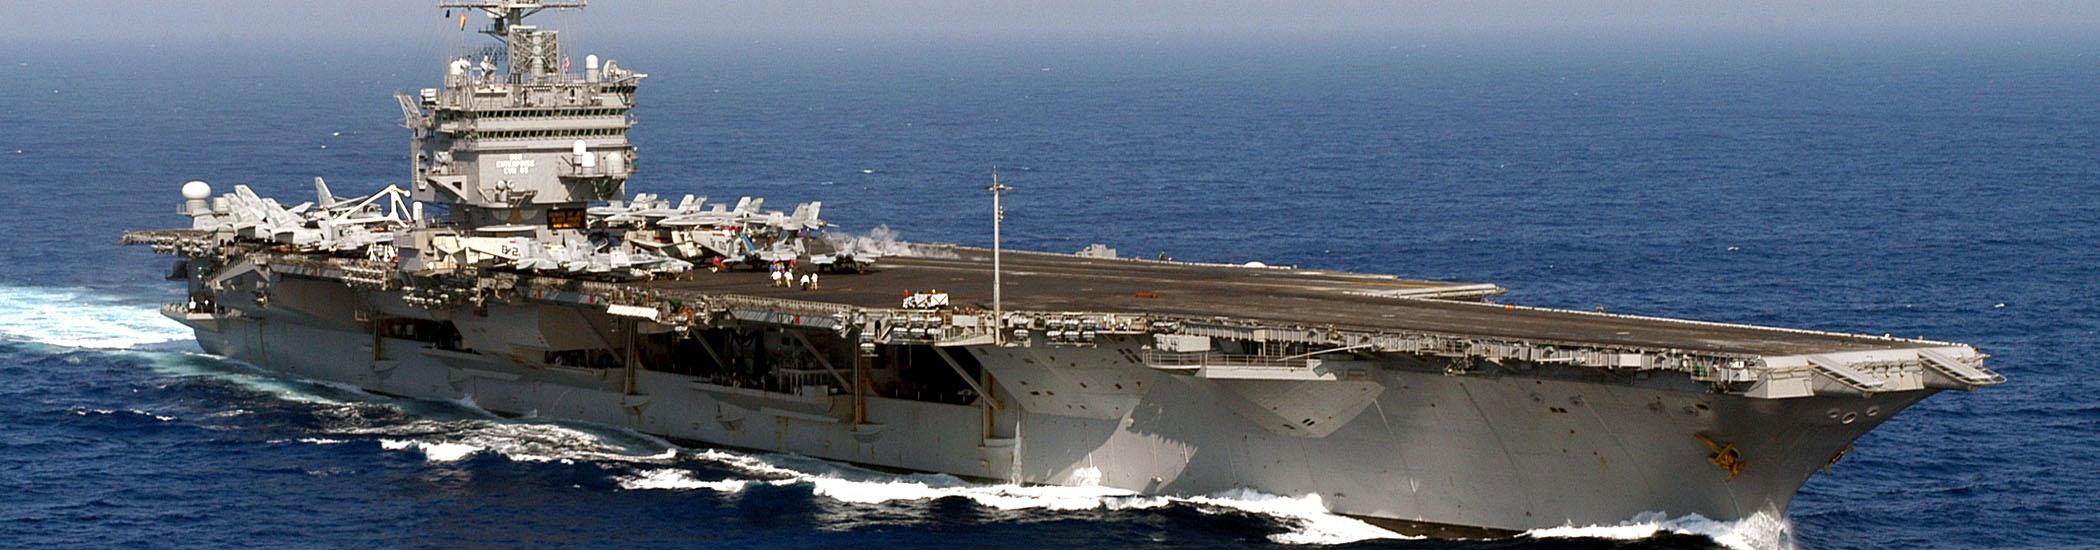 Enterprise at sea